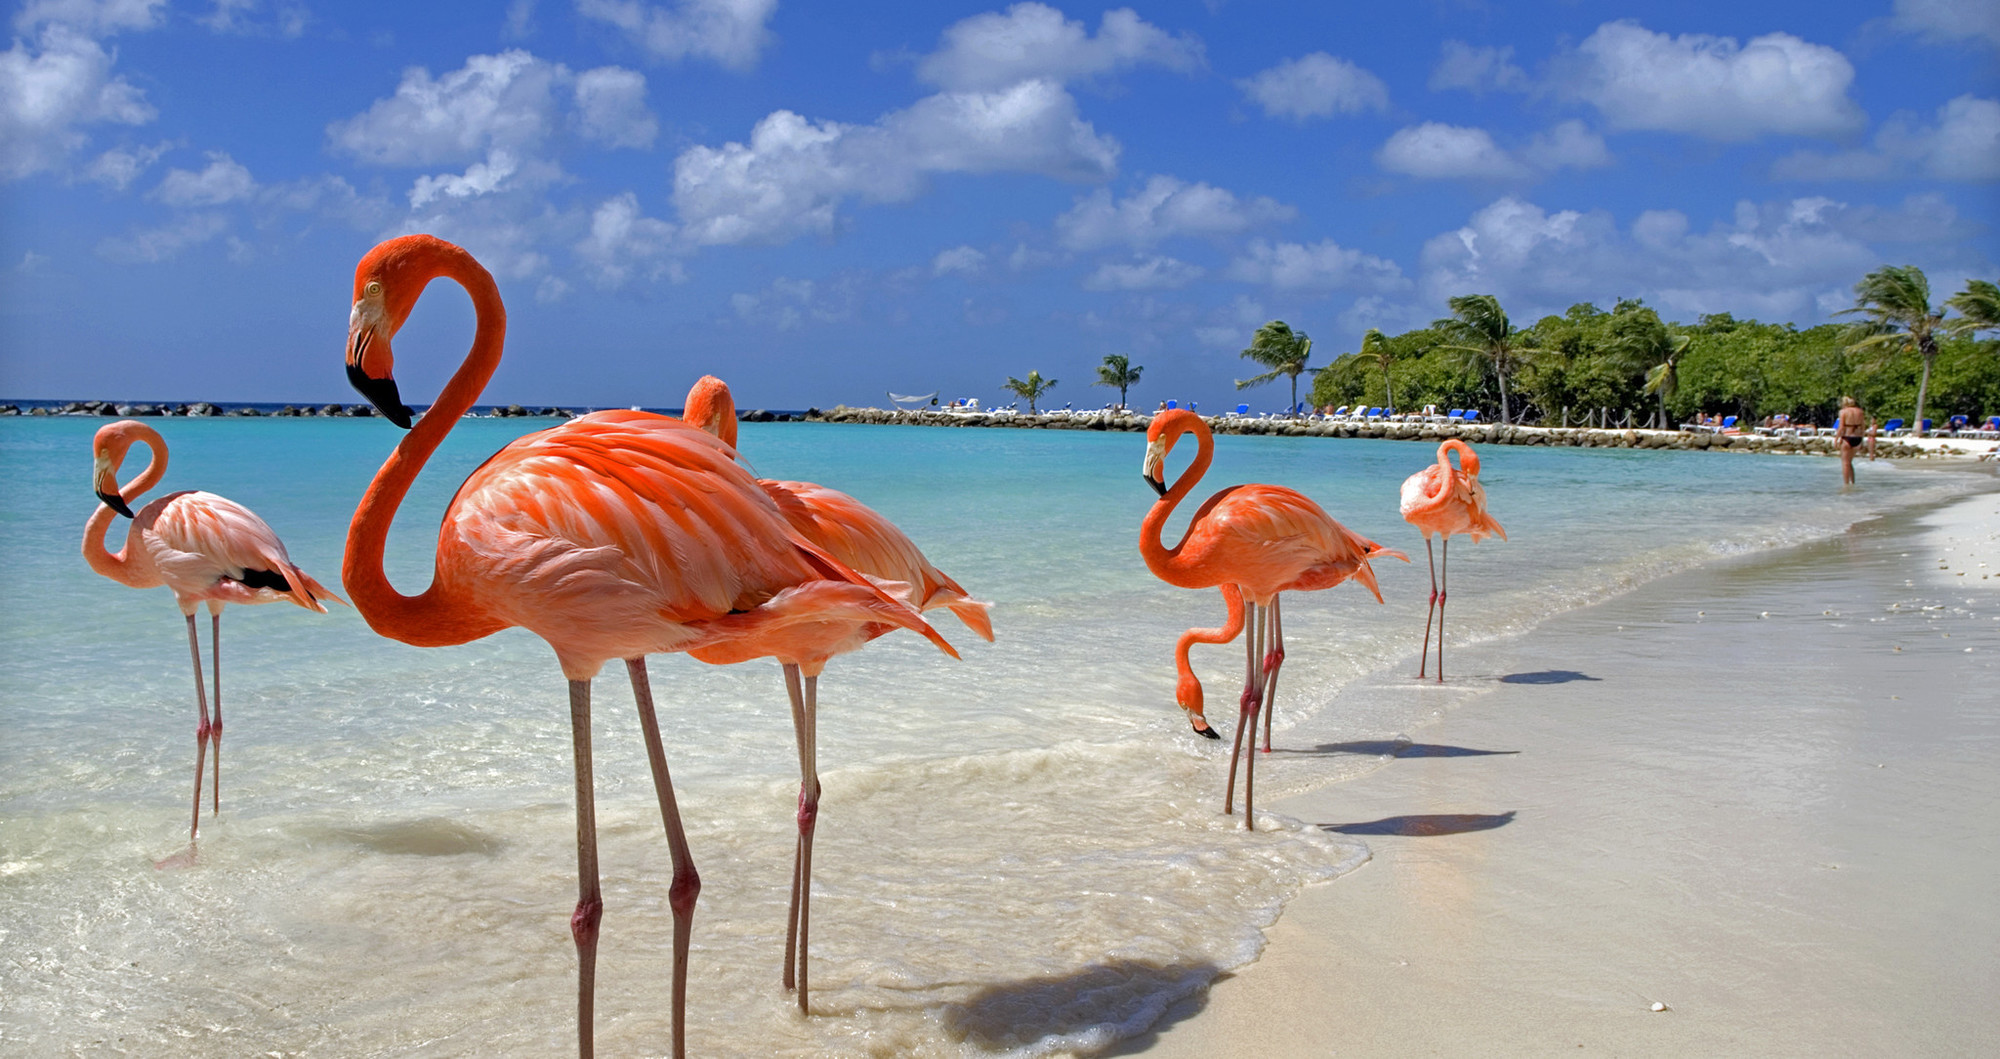 flamingos on the beach in aruba